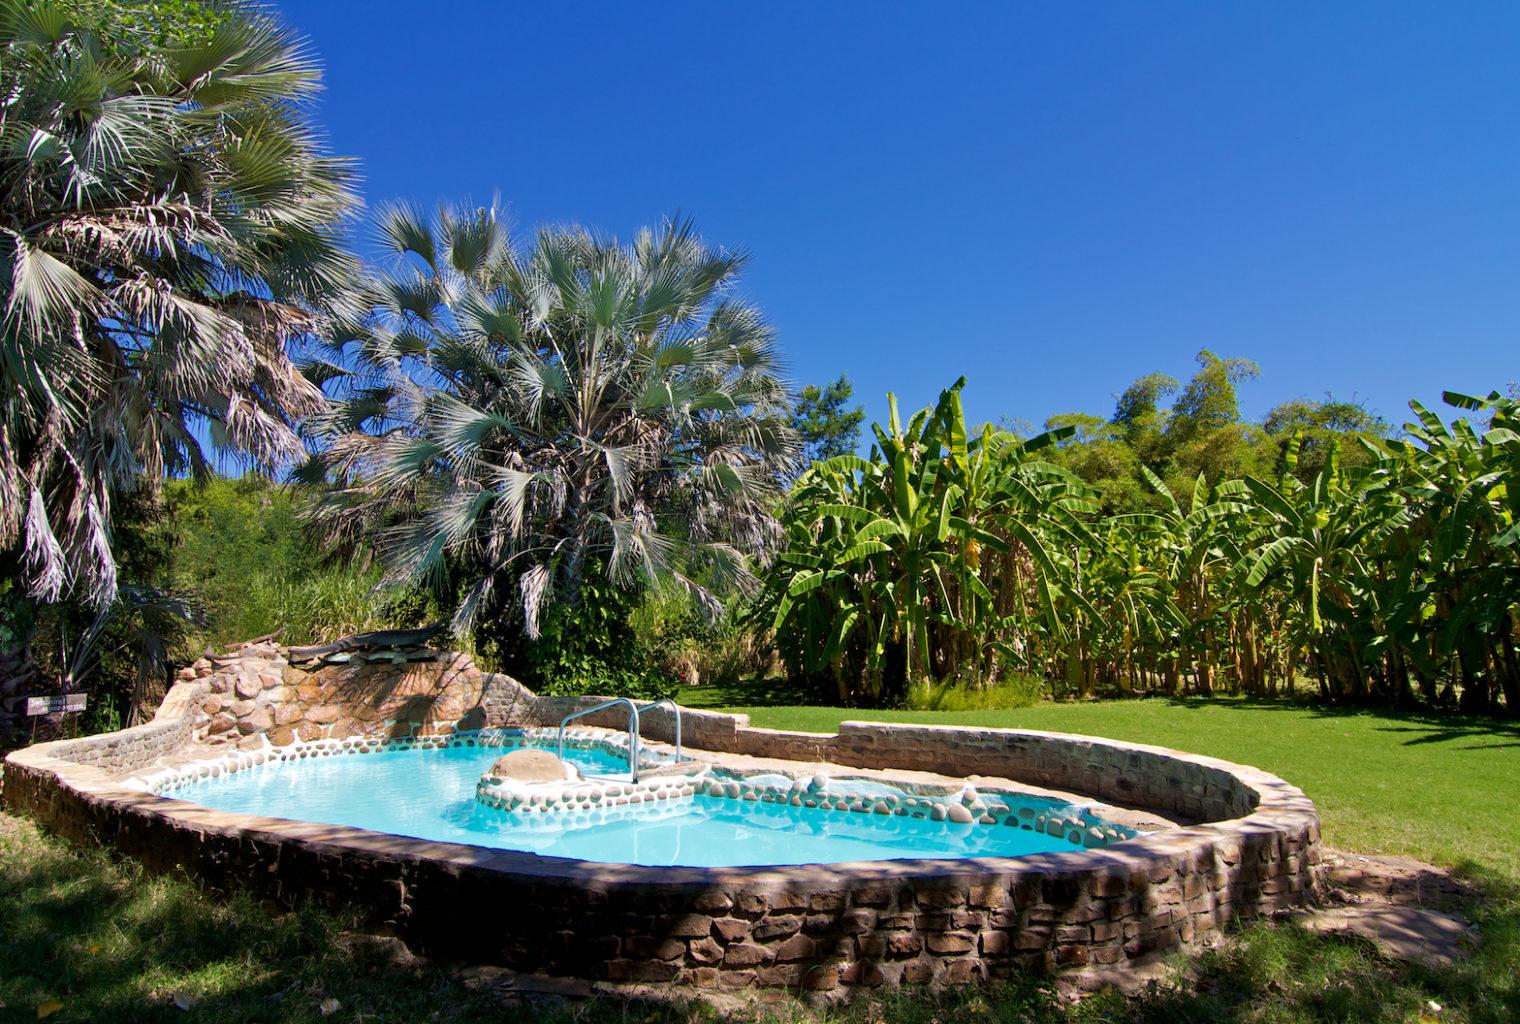 Kunene River Camp Pool